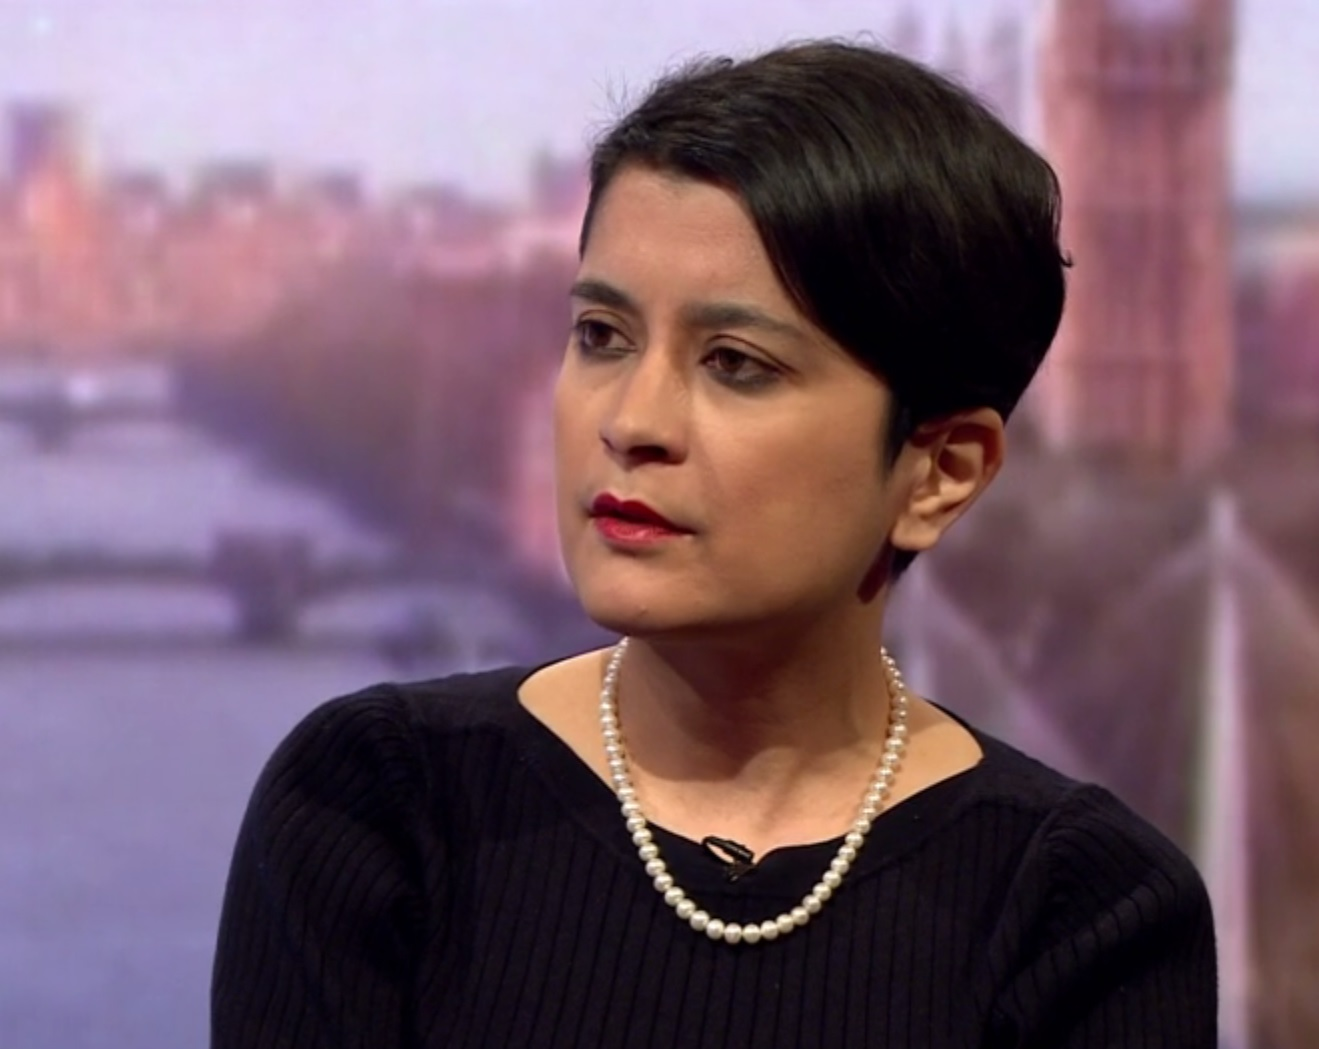 Labour Peer Baroness Shami Chakrabarti